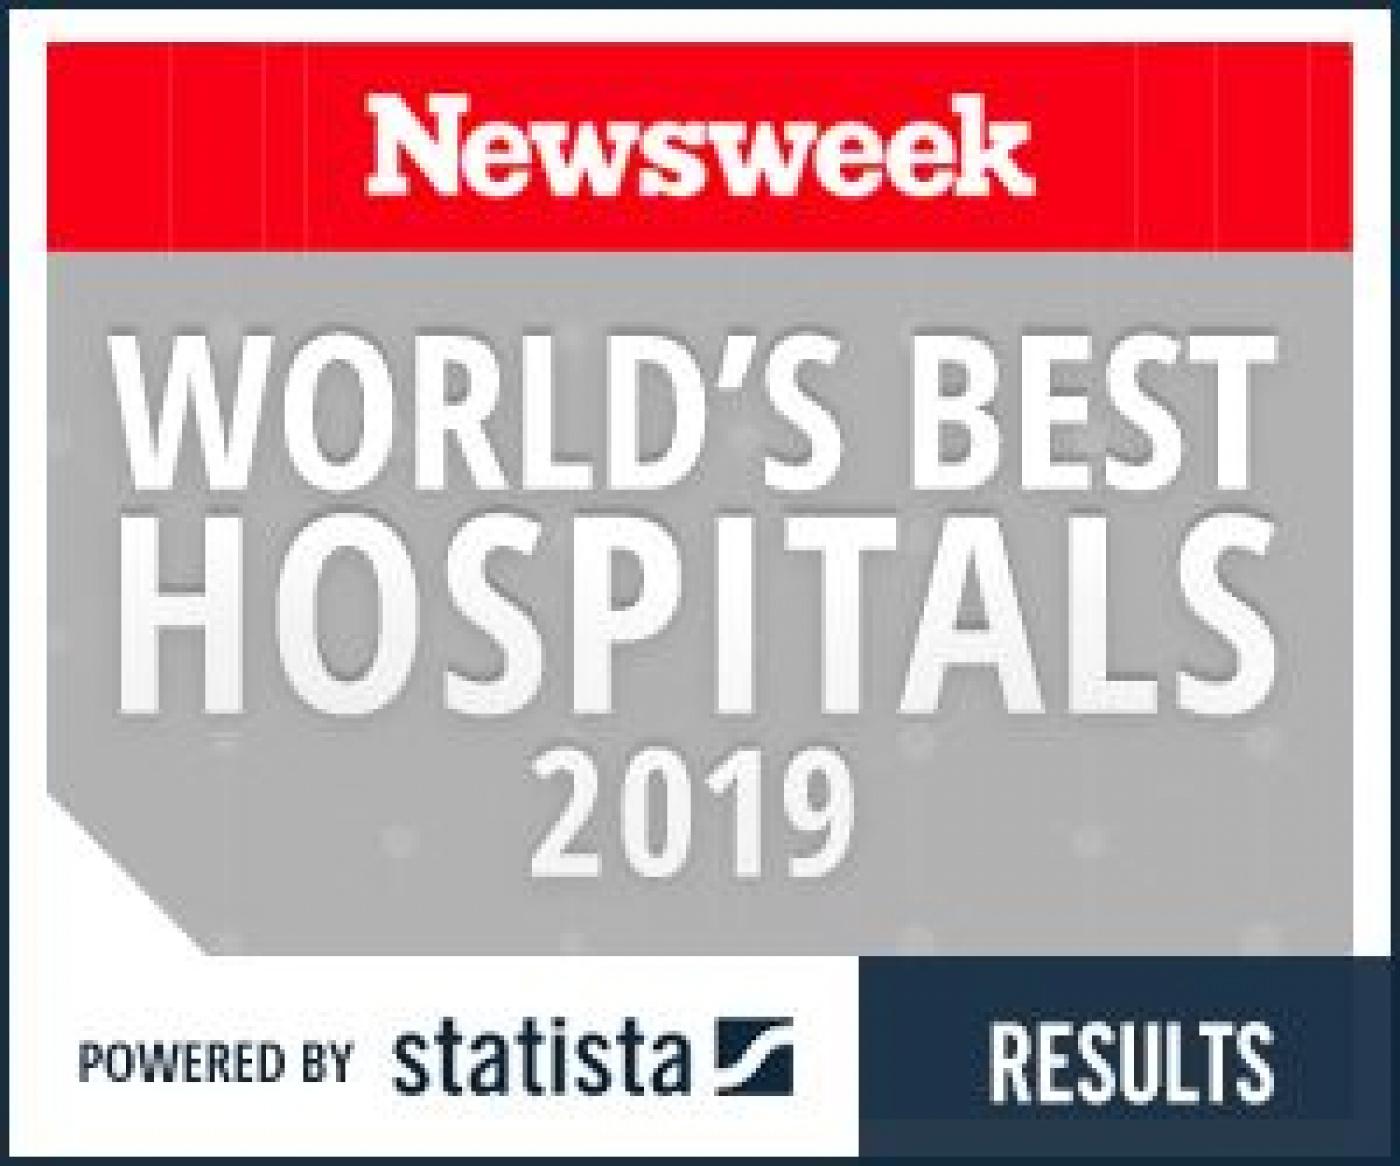 2019-0328-Best-Hospital-TD-300x250